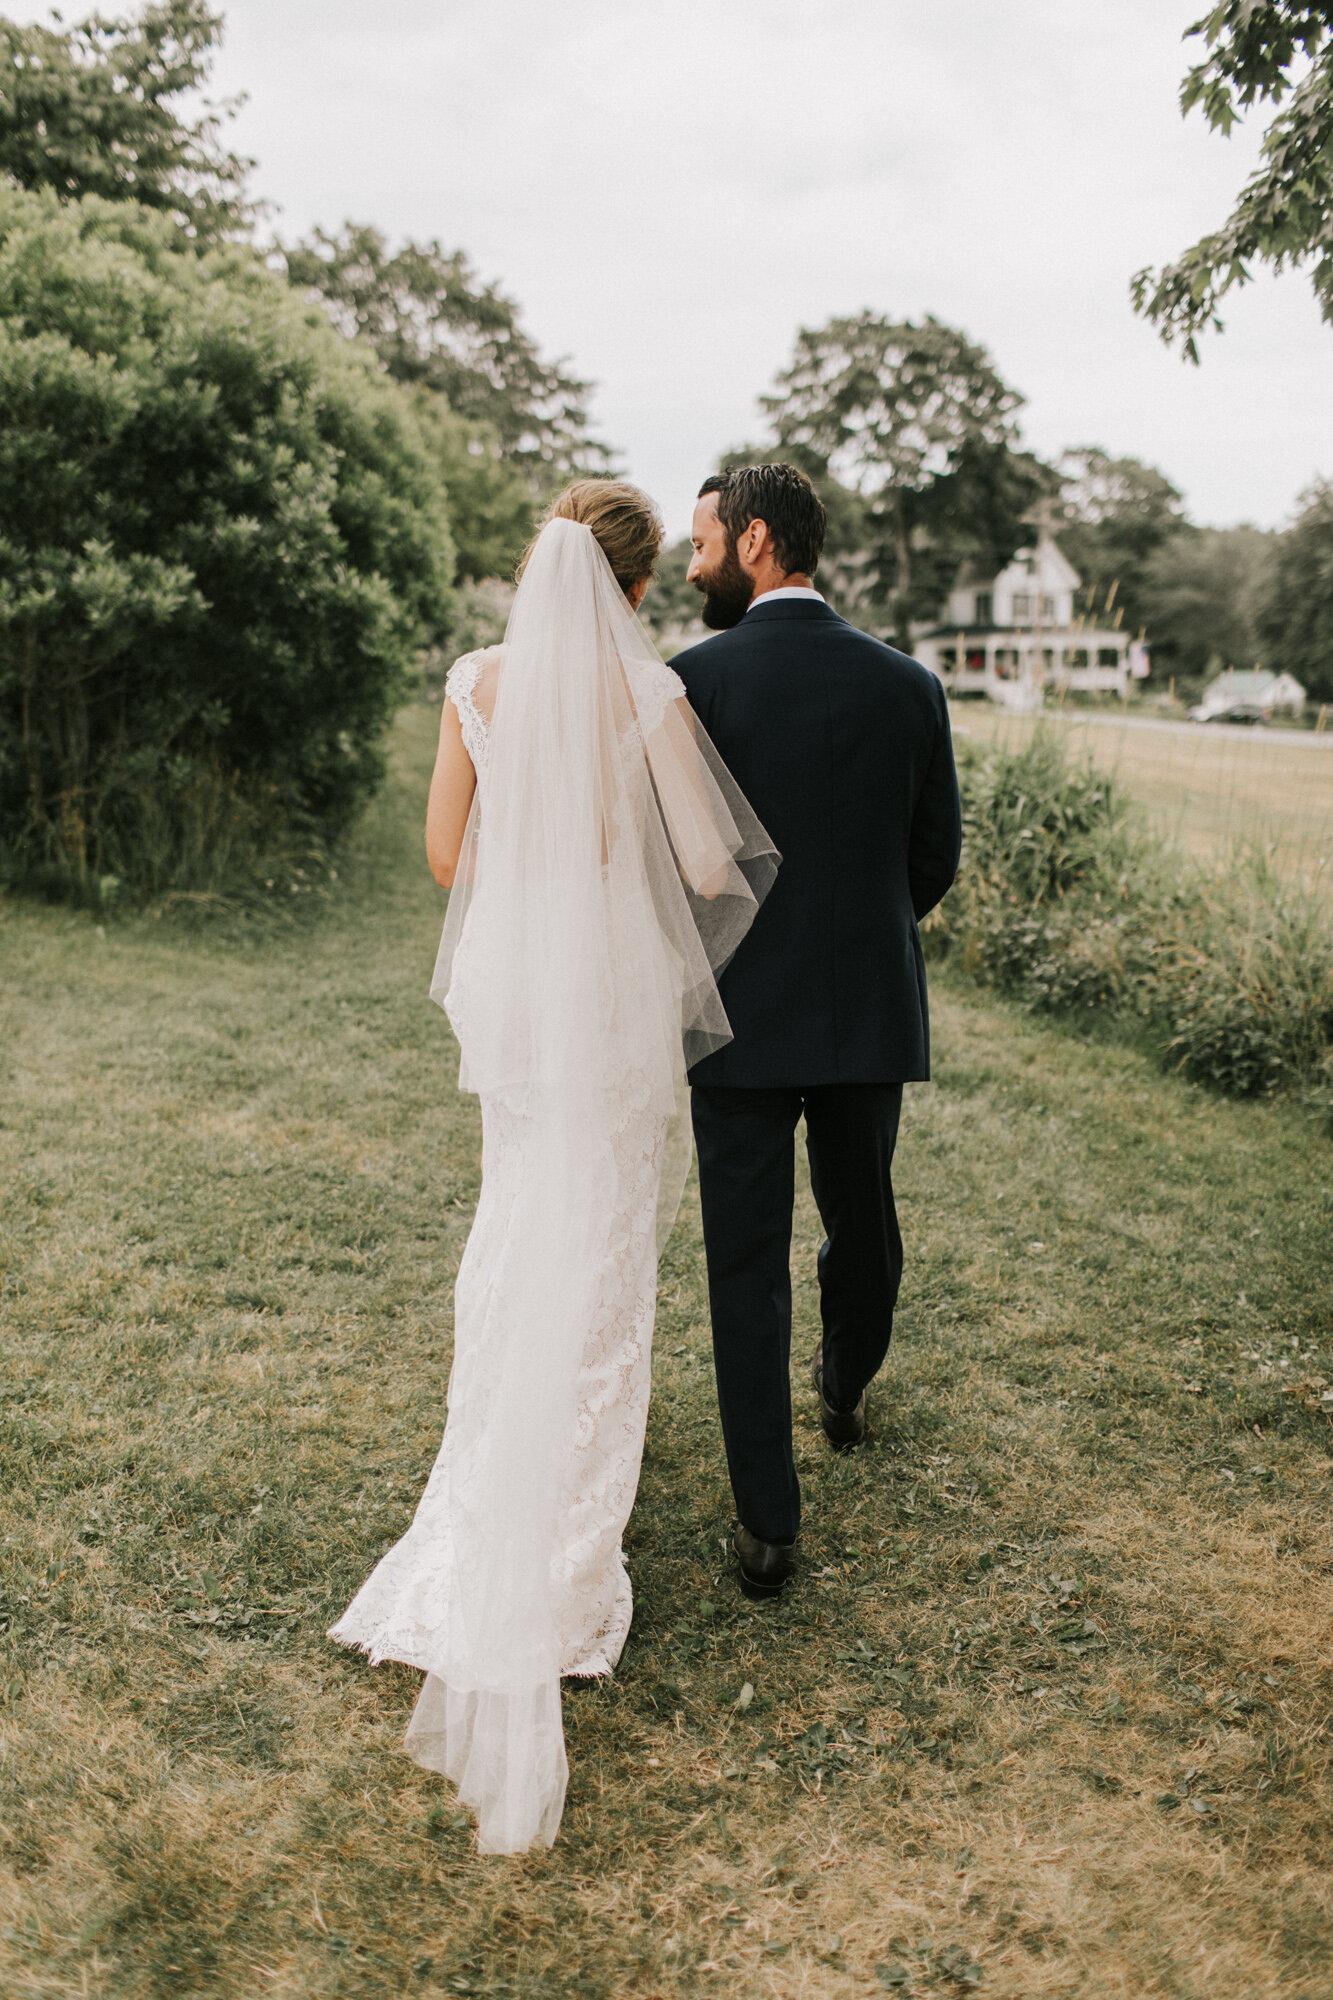 Chebeague+Island+Inn+Wedding+Maine+Jamie+Mercurio+Photography-0059.jpg